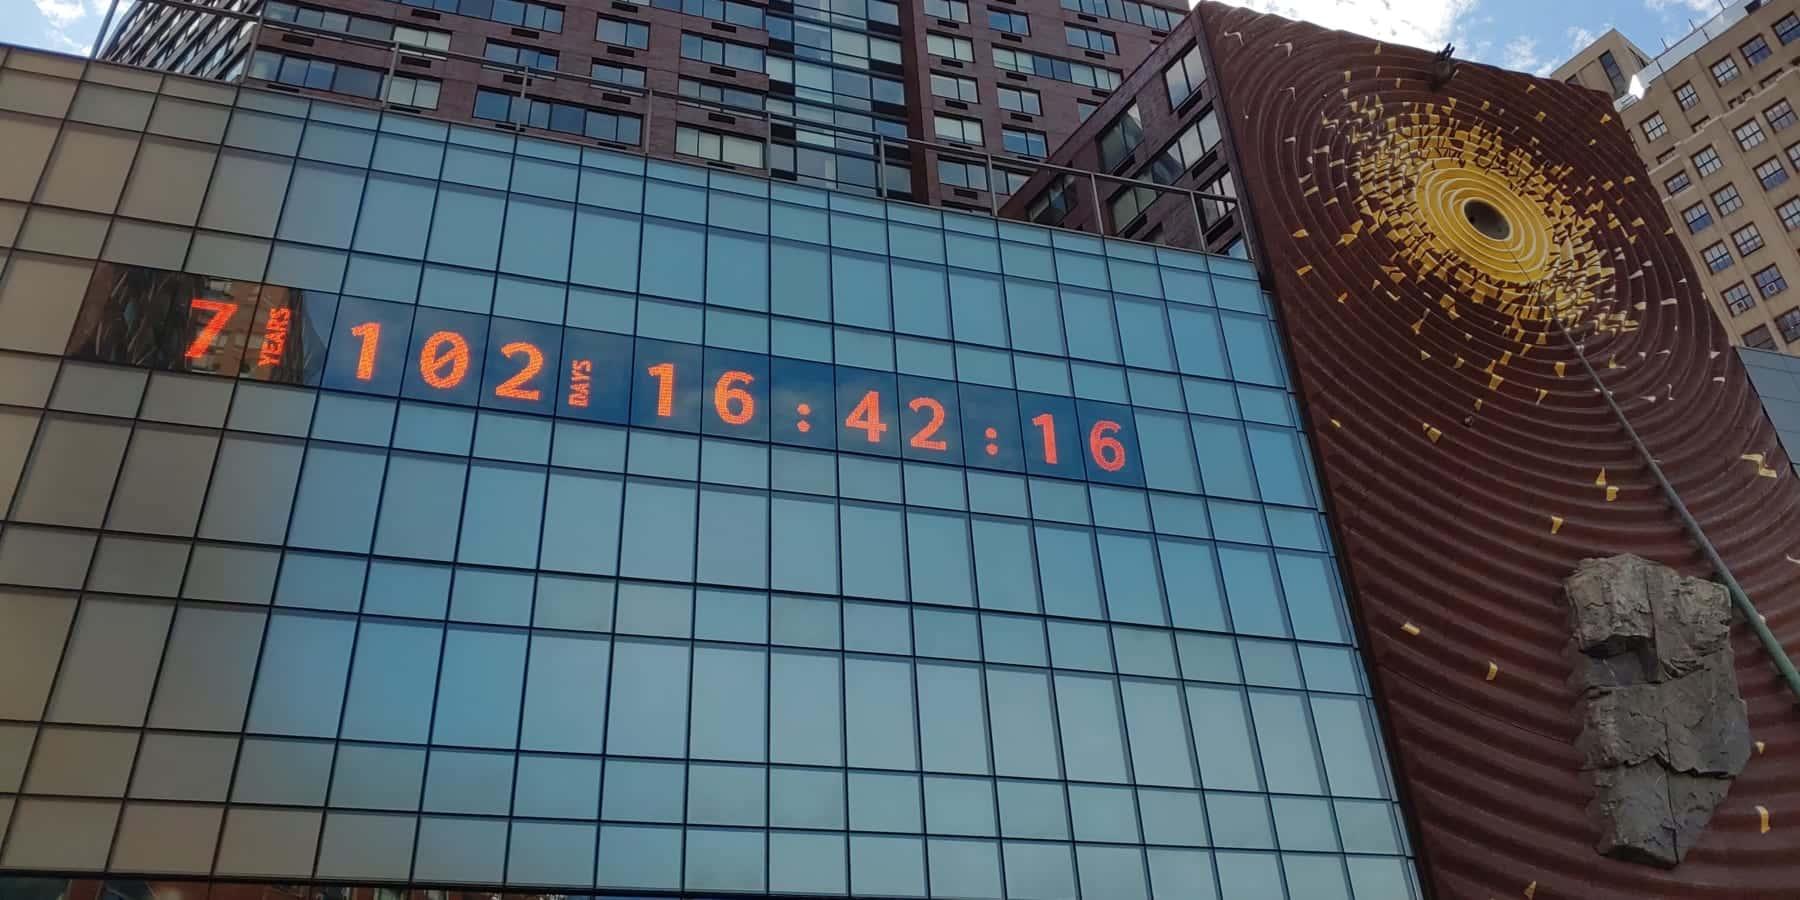 NYの街中アートが示す、私たちに残された時間「7 102 16:42:16」